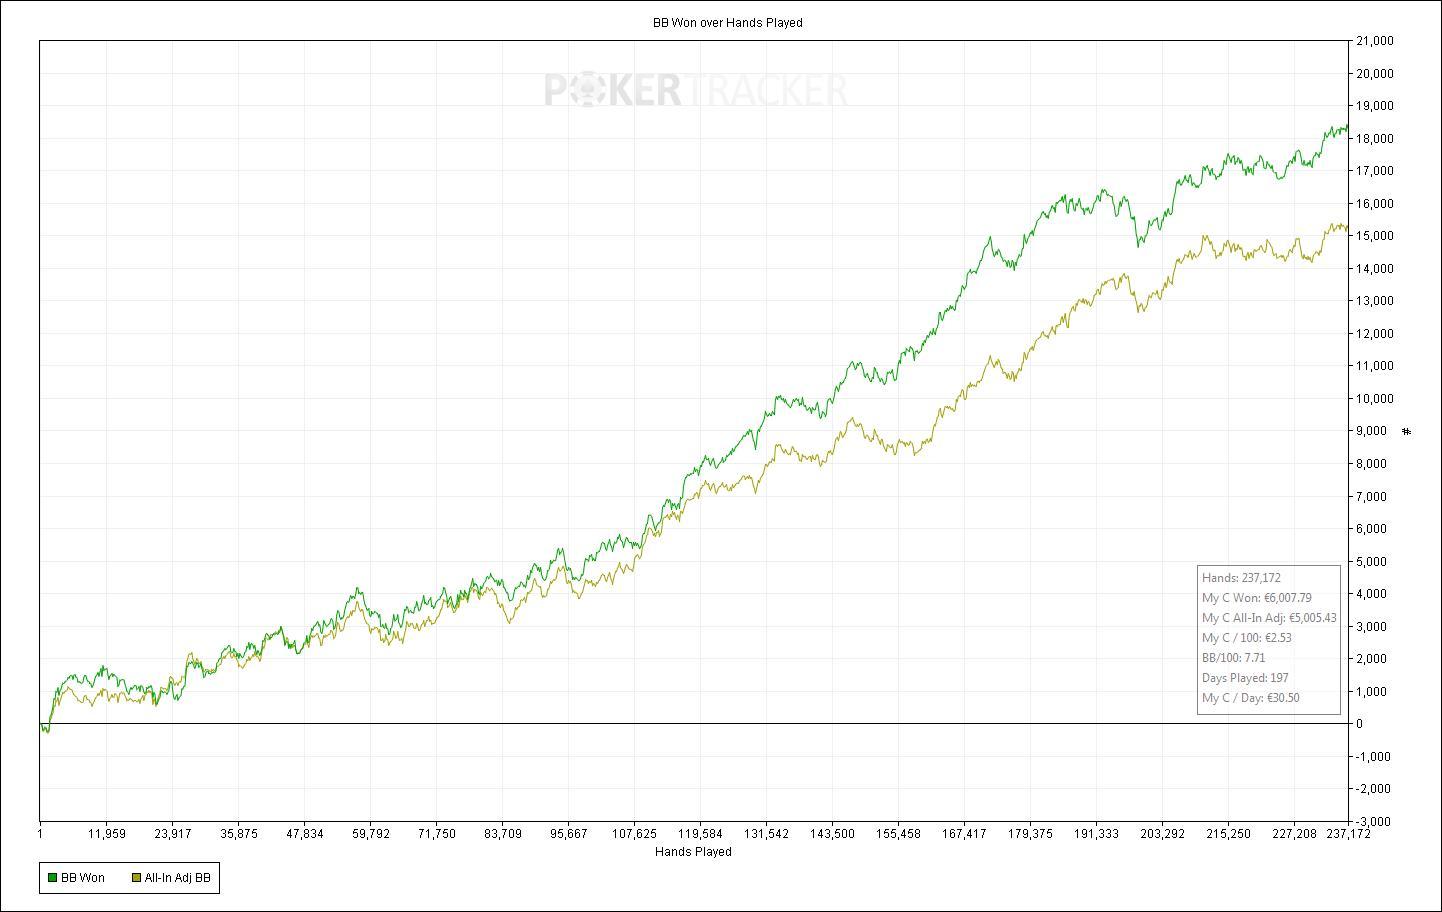 graph_2016_BB.jpg